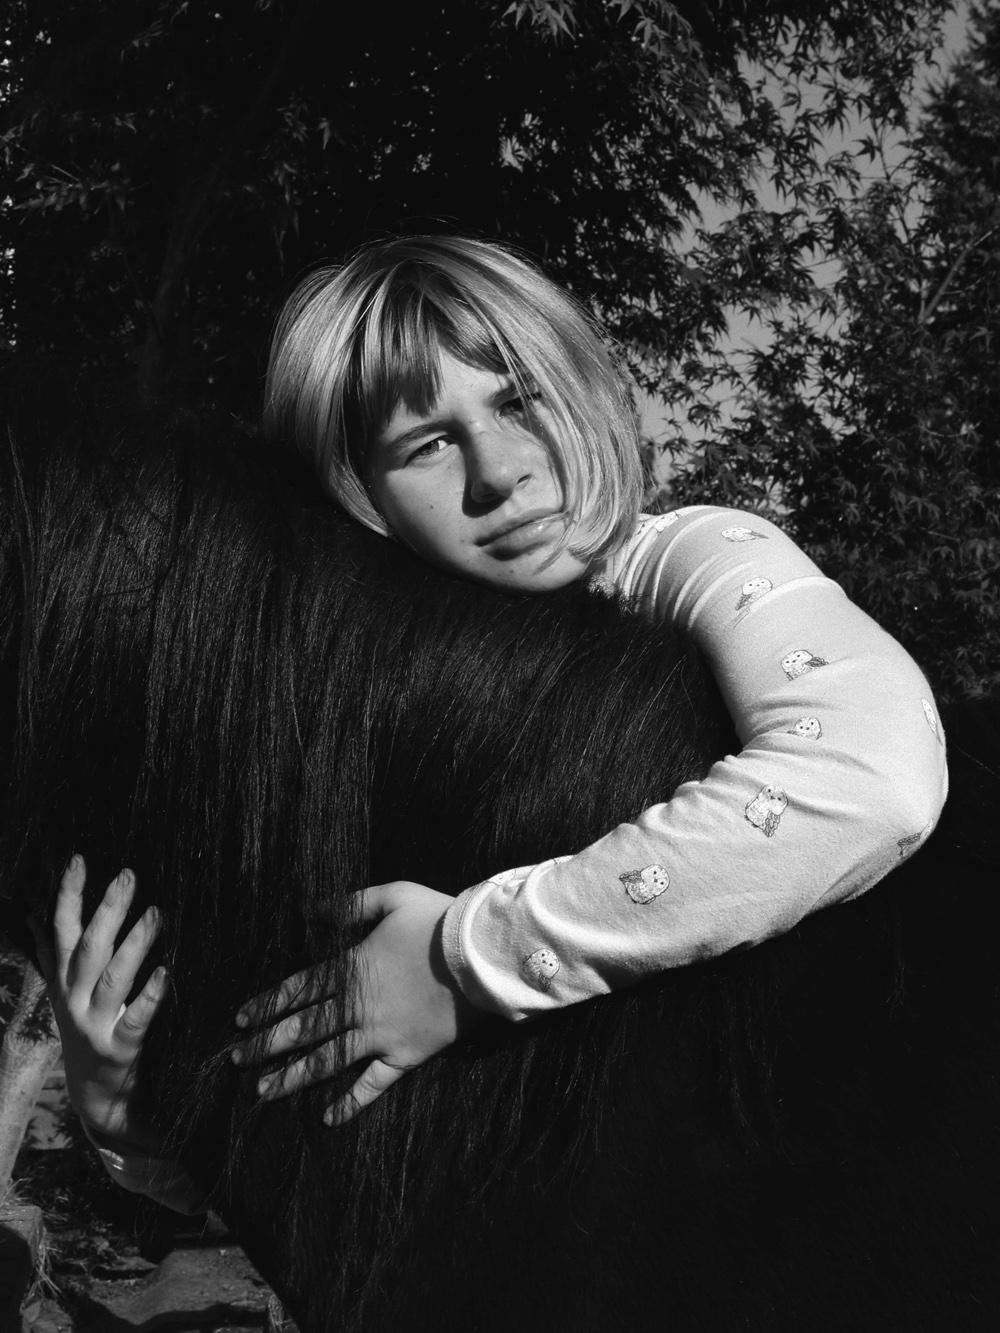 02_AntoniaStoyanovich_Friendofthehorse